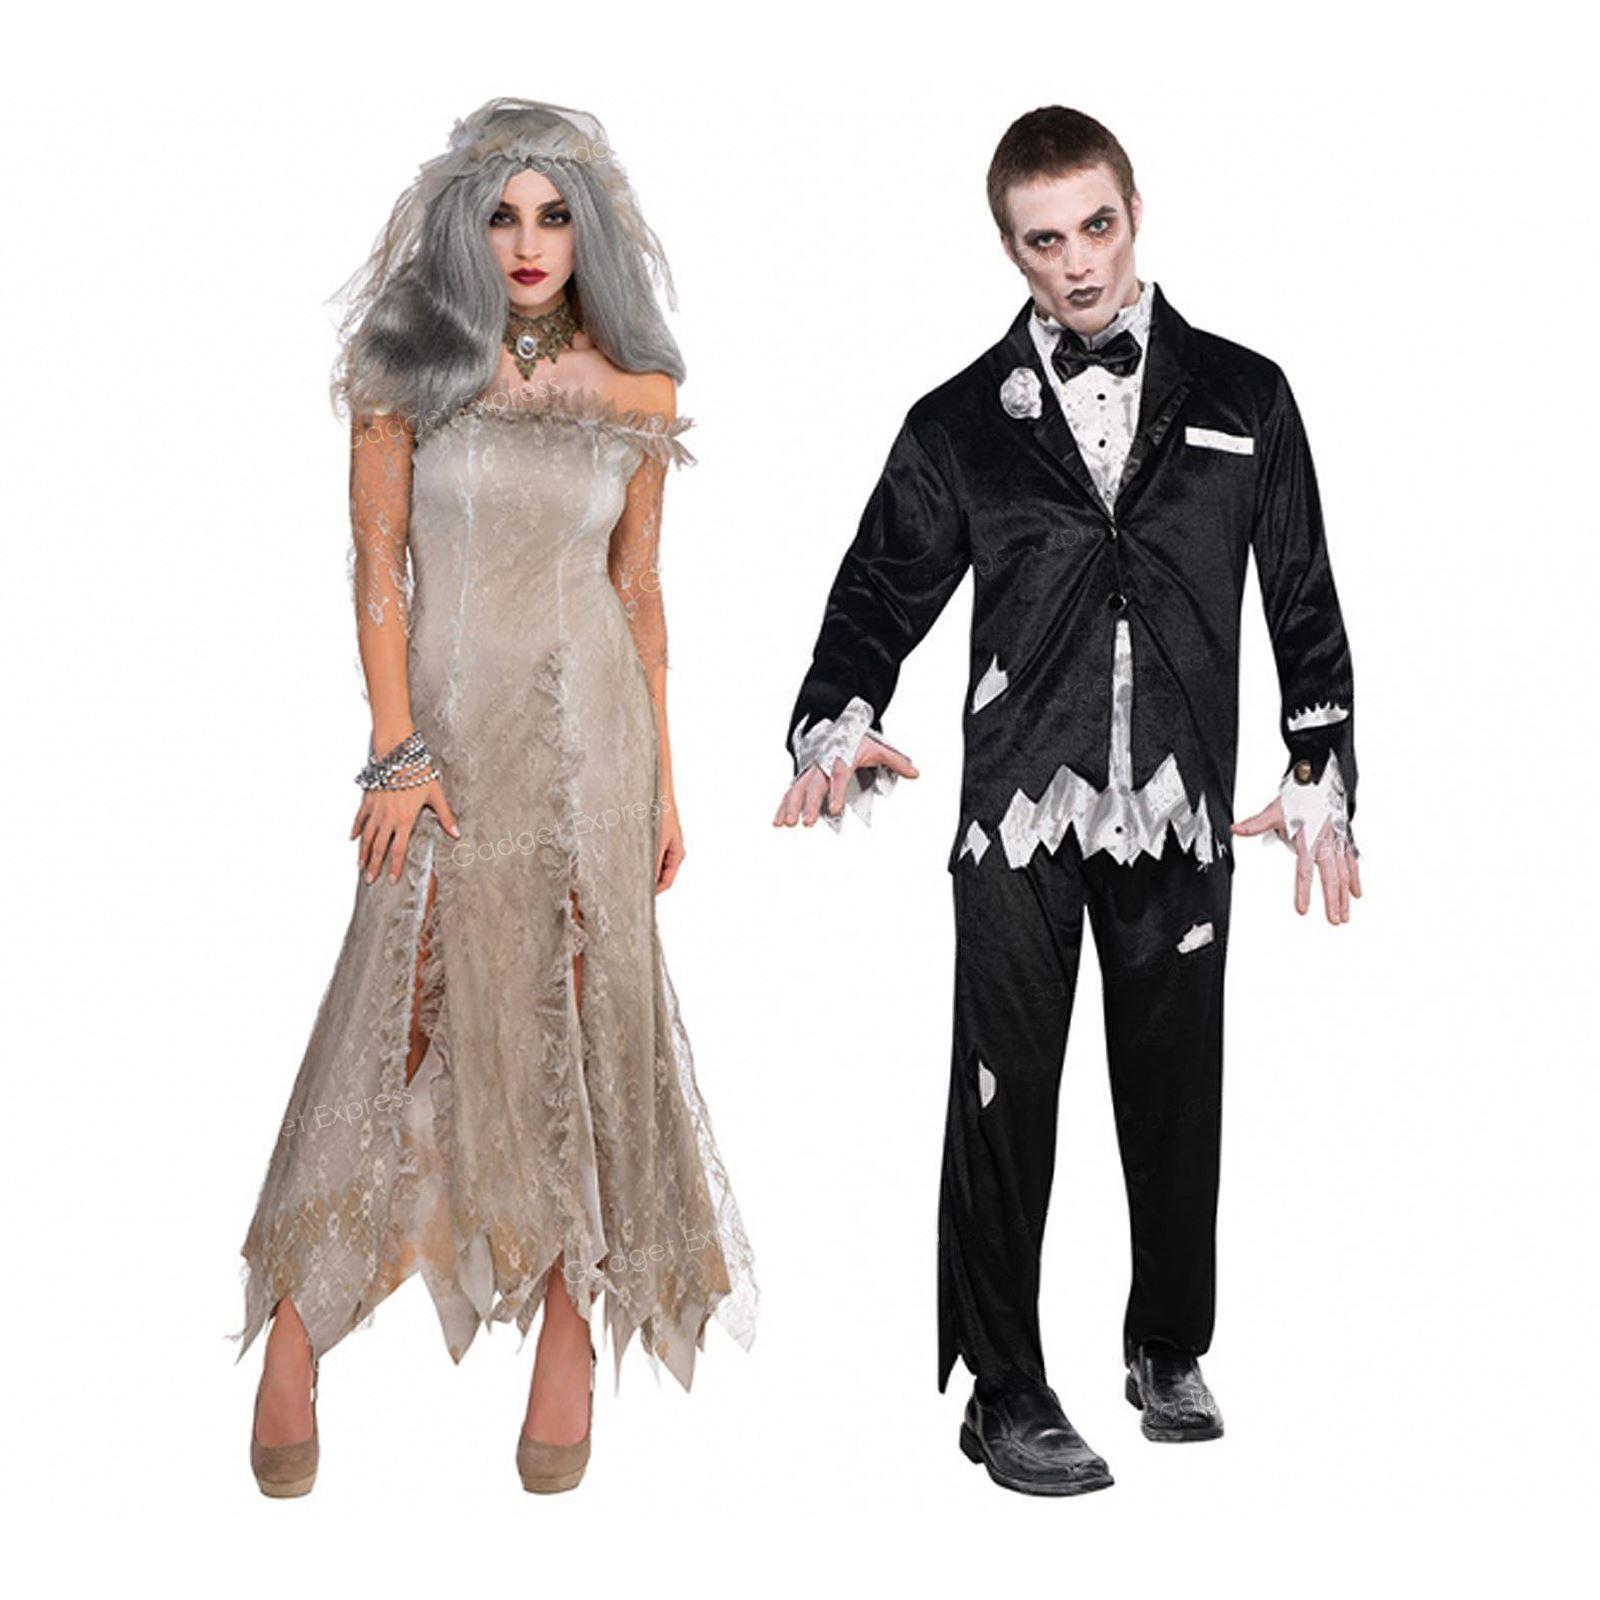 mens ladies zombie dead bride groom couples costume adult halloween